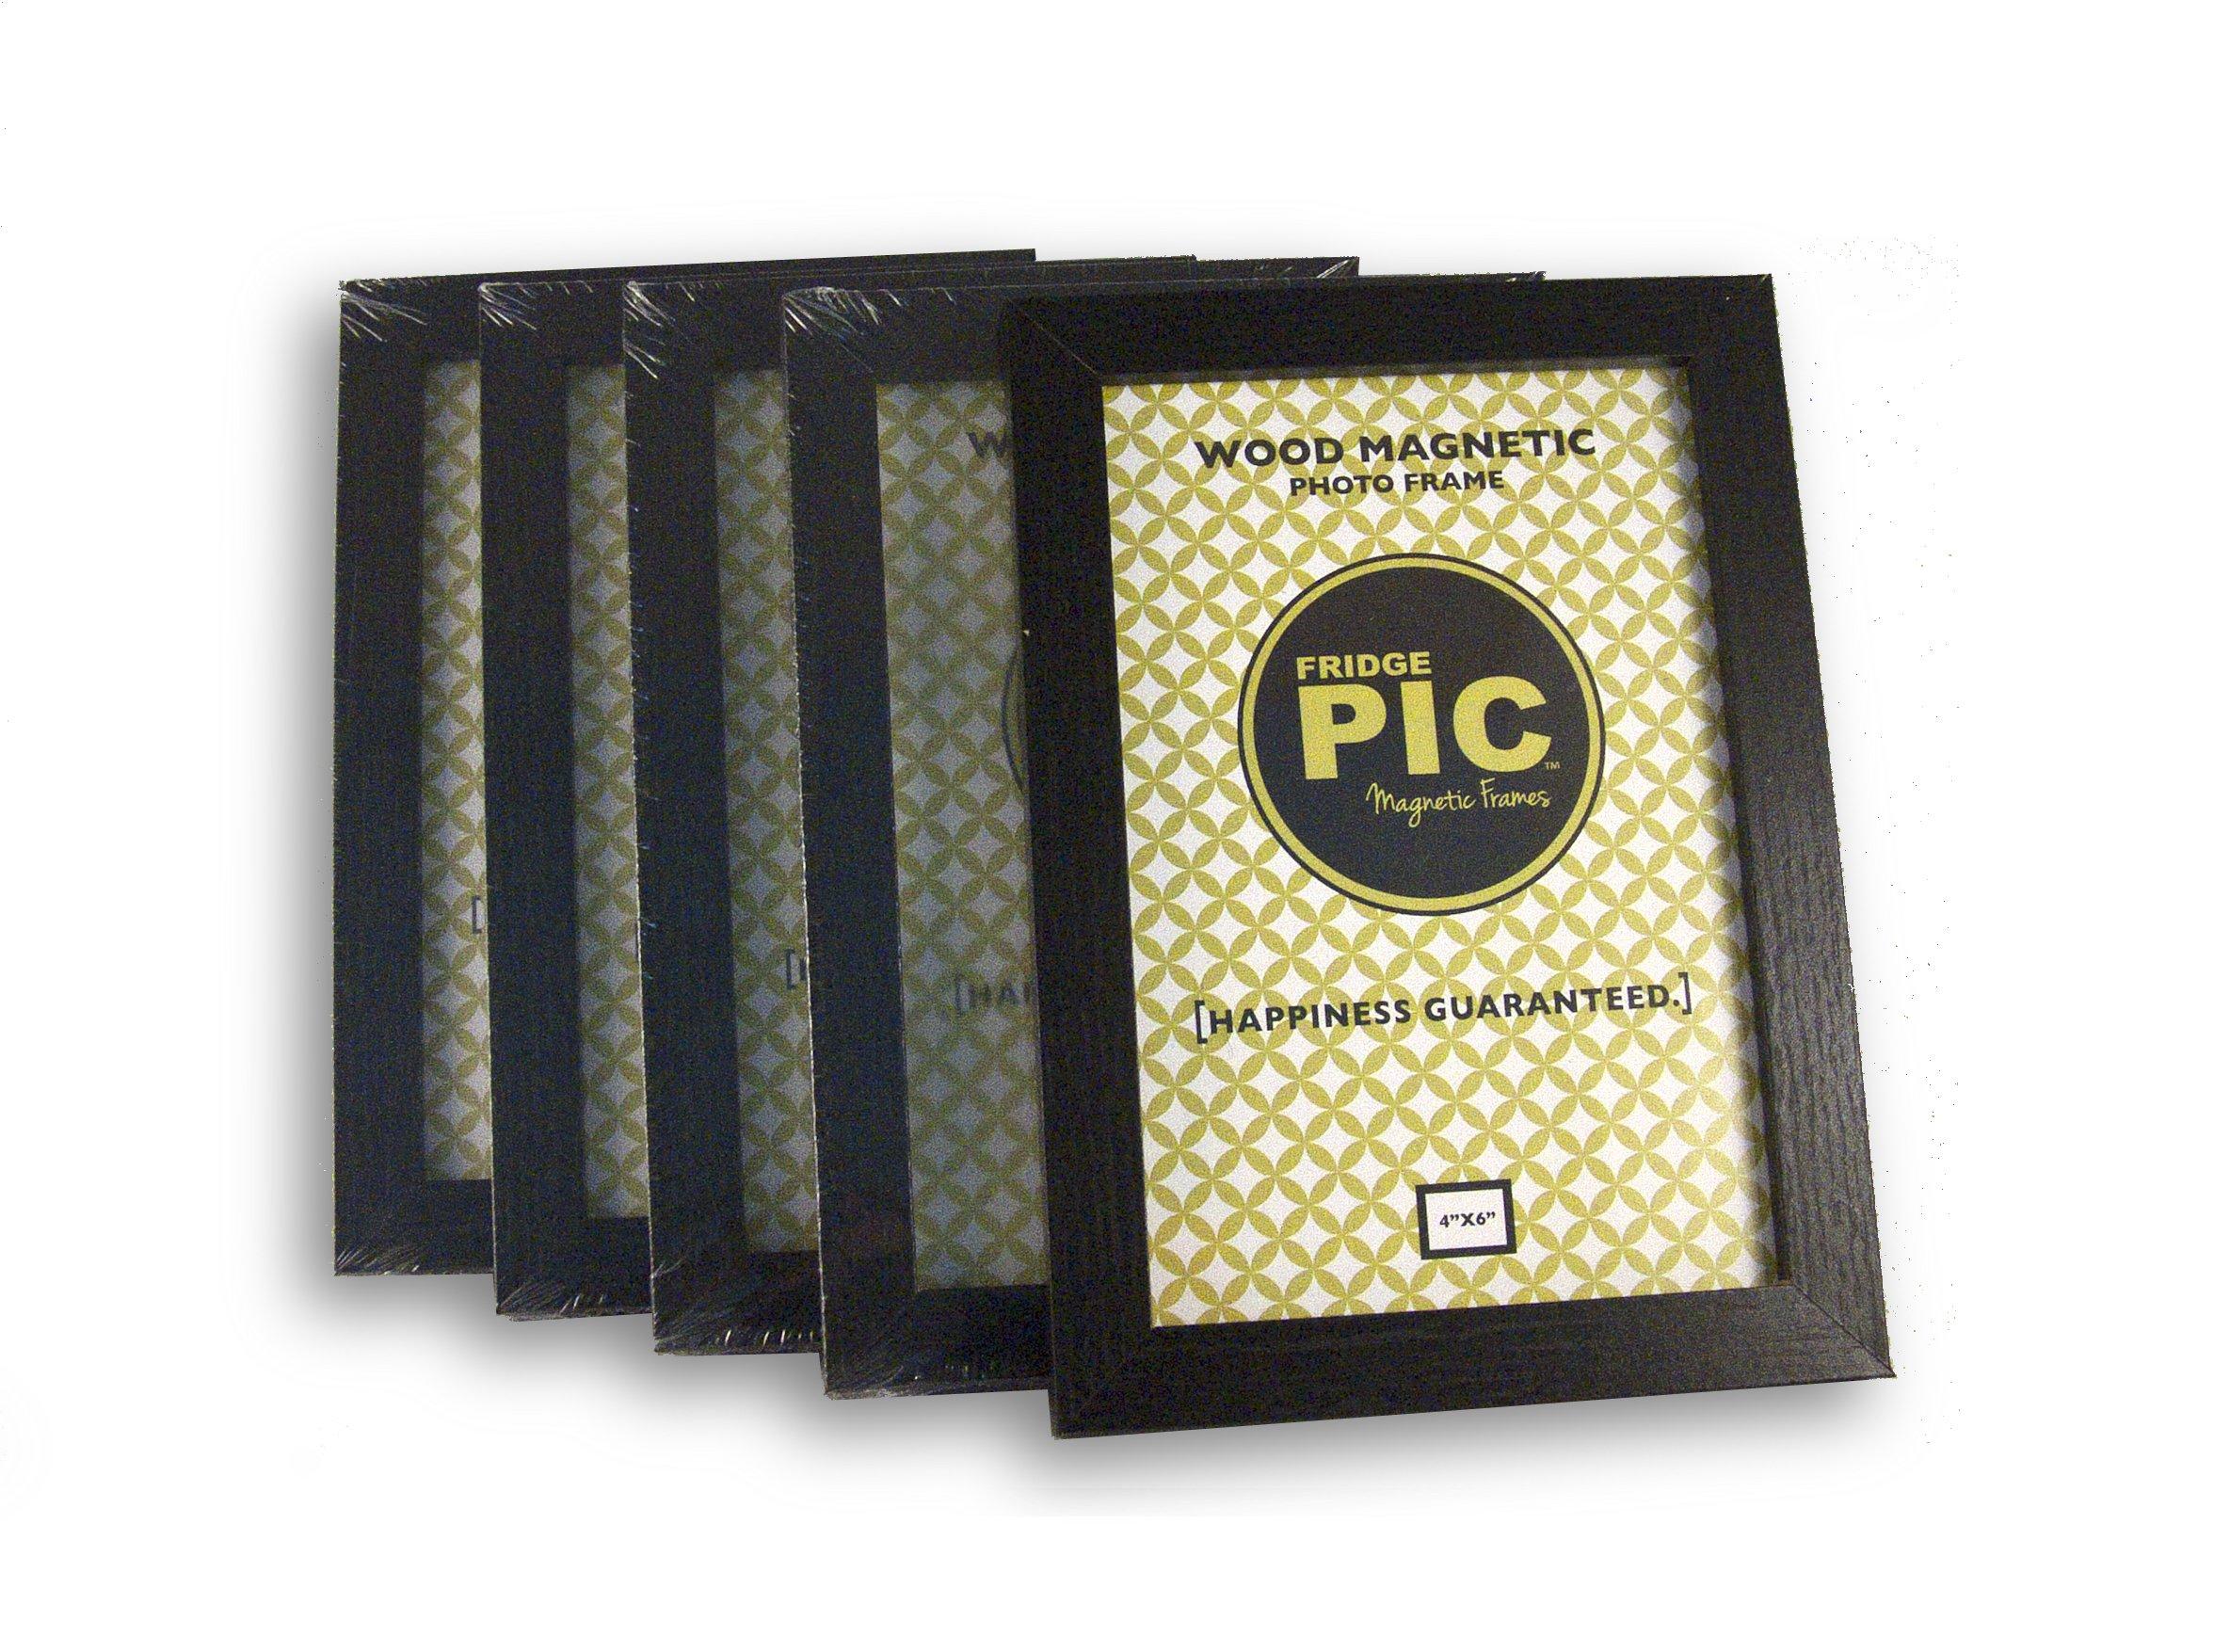 Fridgepic Wood Magnetic Photo Picture Frames, Black - Set of 5 (4x6) by FridgePIC Magnetic Frames (Image #6)